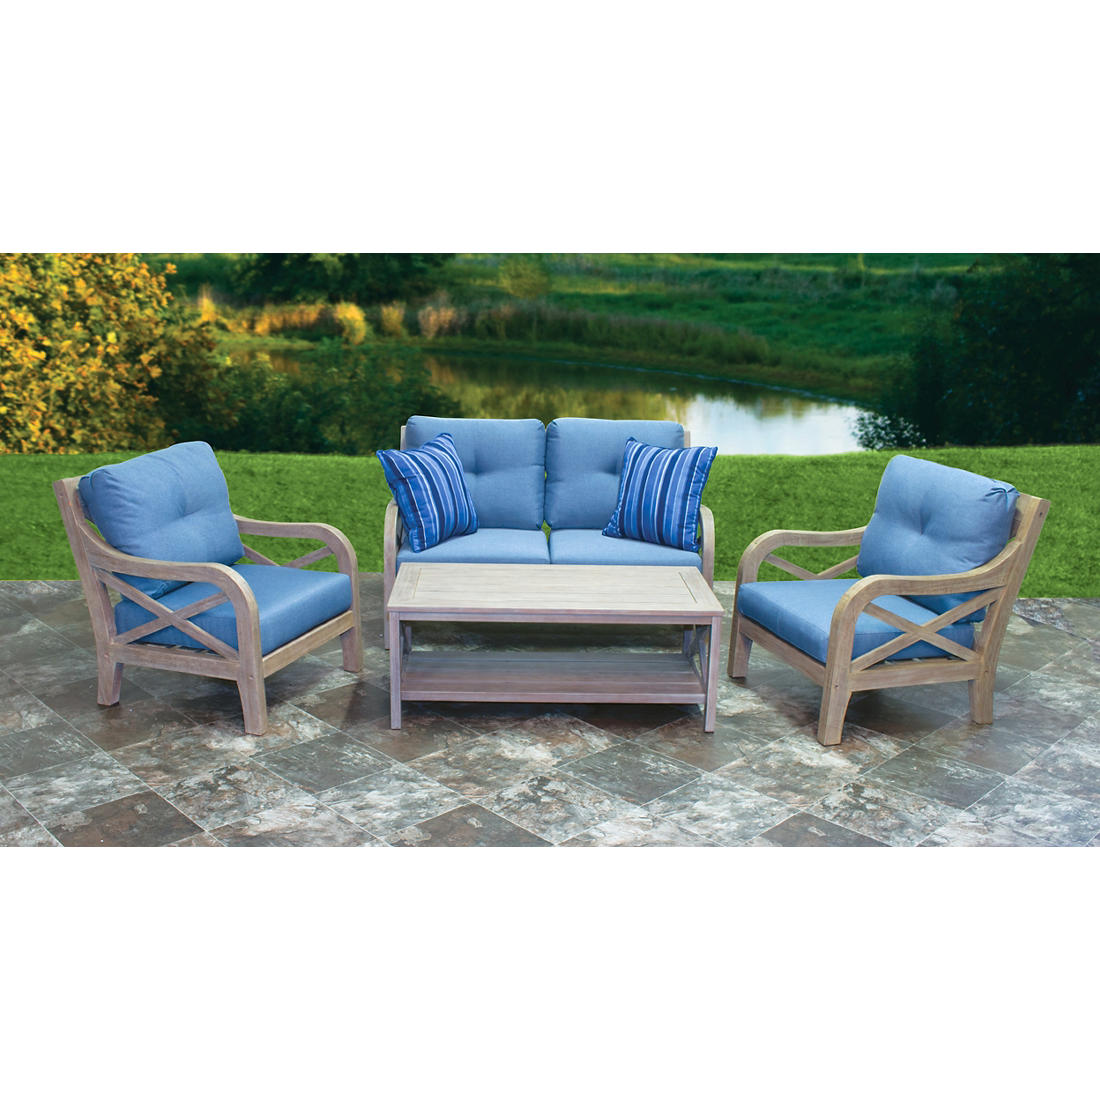 Enjoyable Berkley Jensen Villa 4 Pc Deep Seating Set Theyellowbook Wood Chair Design Ideas Theyellowbookinfo